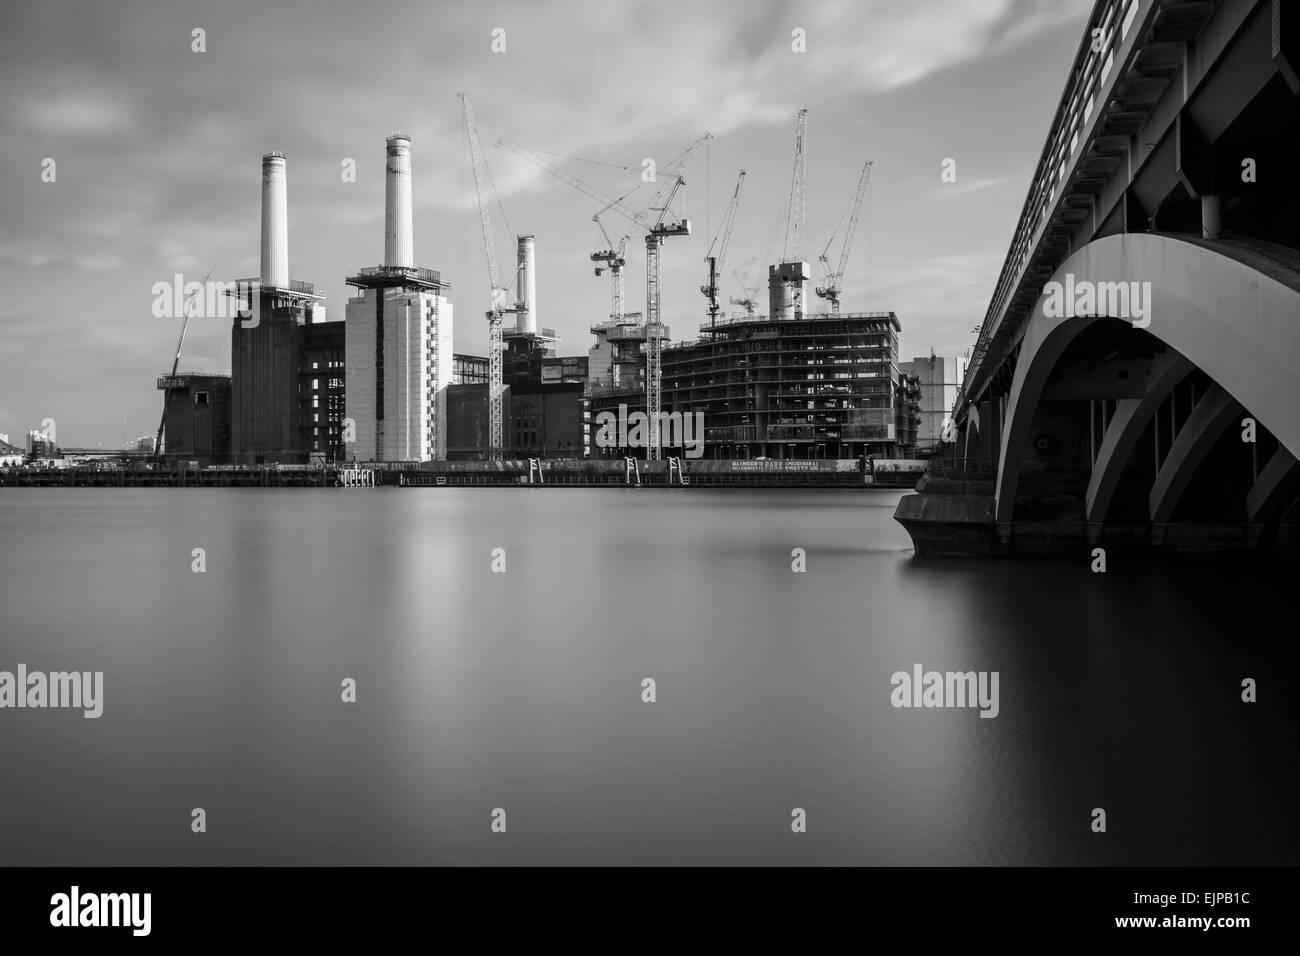 Battersea Power Station, a London landmark, England. - Stock Image